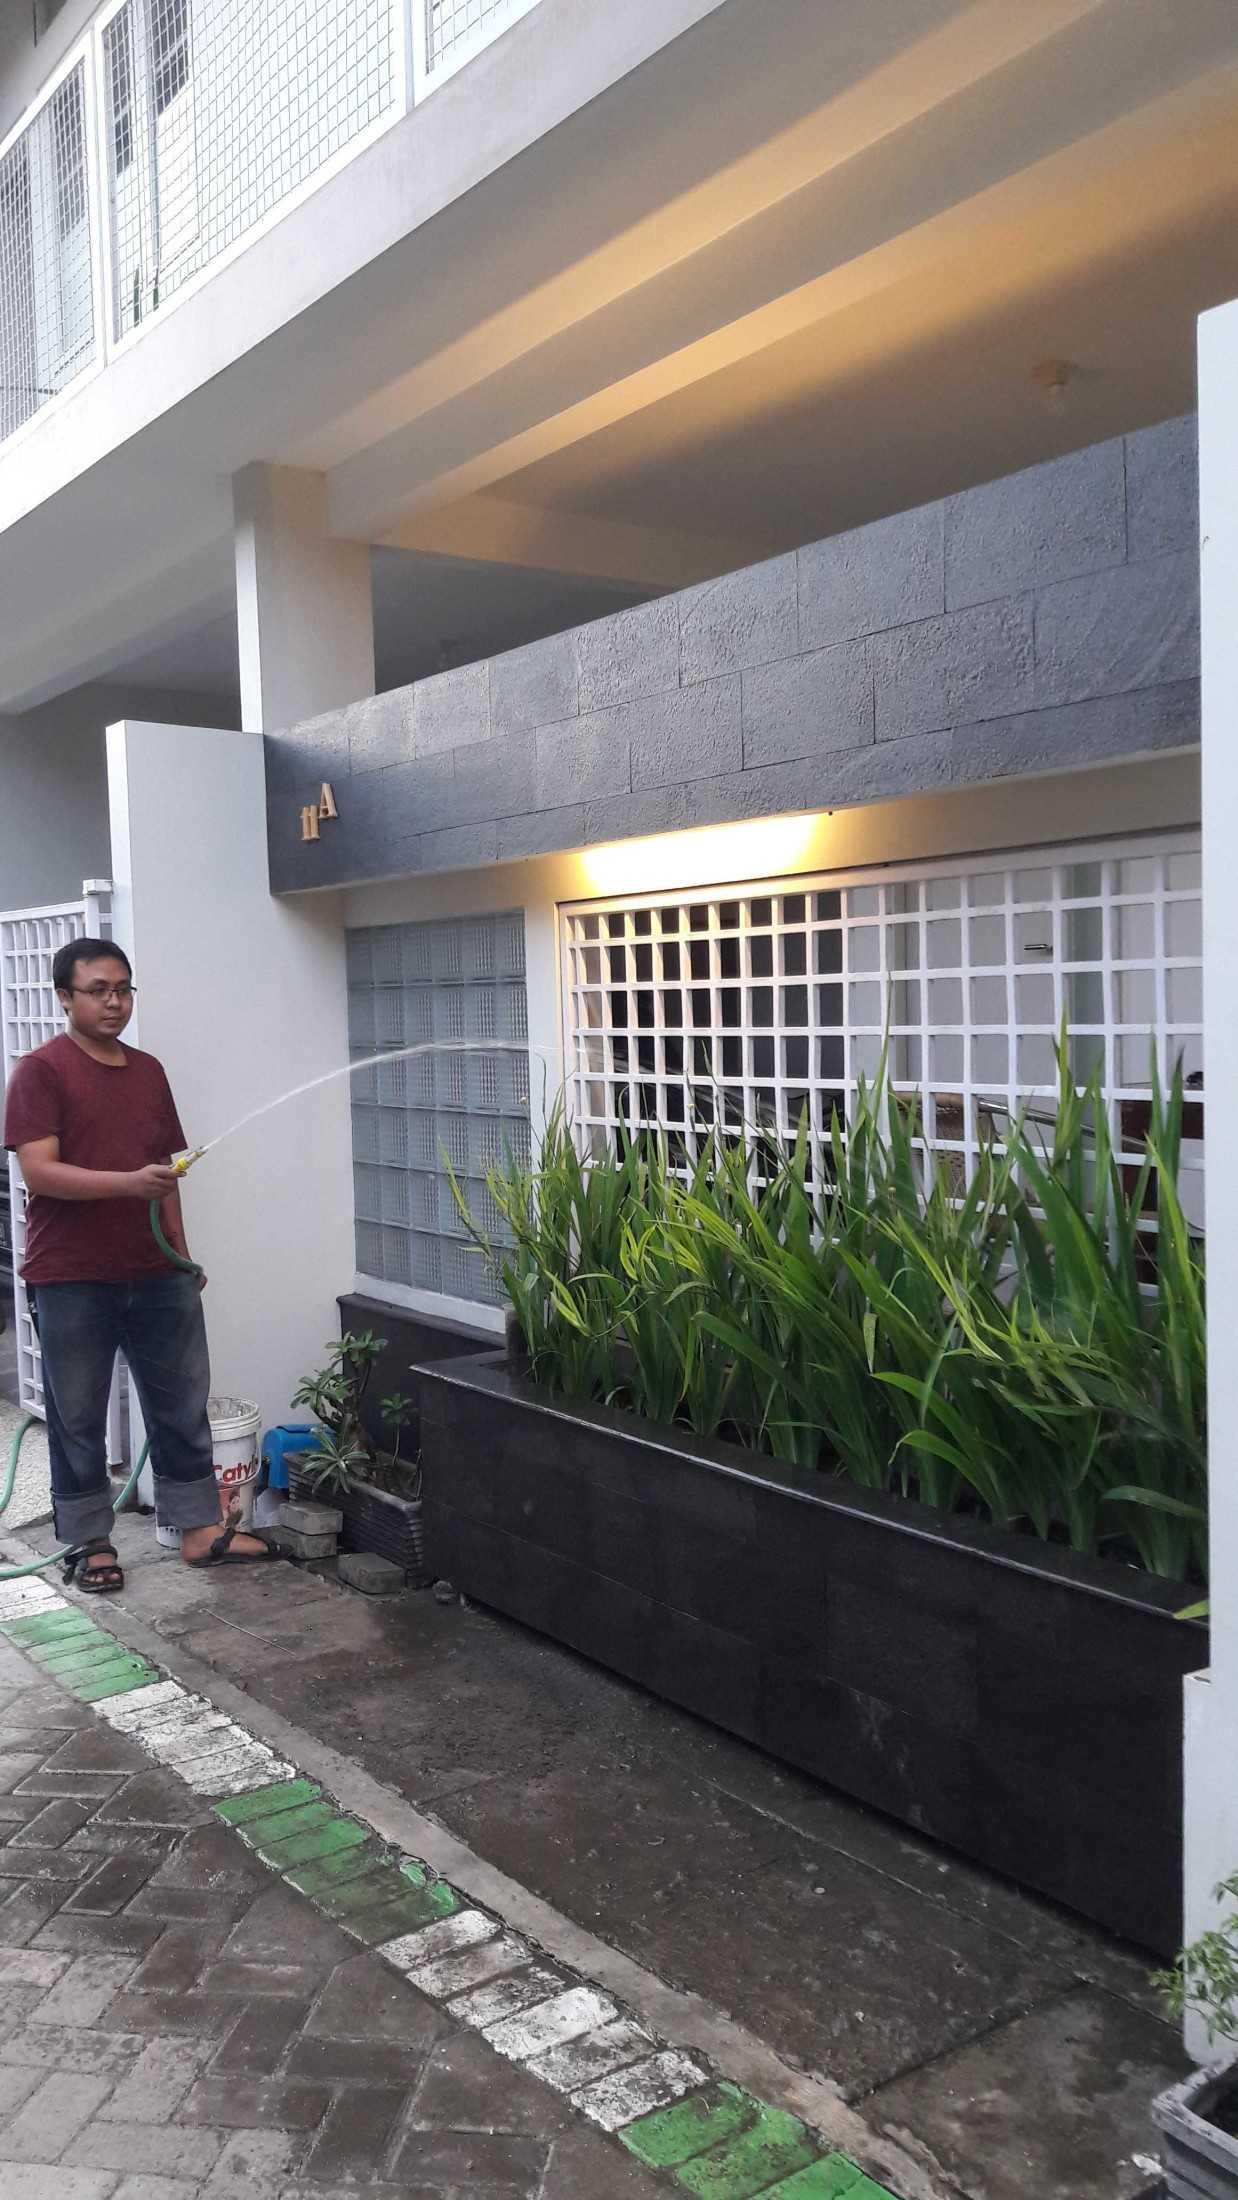 Gradasi Eky House Kebonsari, Kec. Jambangan, Kota Sby, Jawa Timur, Indonesia Kebonsari, Kec. Jambangan, Kota Sby, Jawa Timur, Indonesia Gradasi7-Rumah-Eky  88999